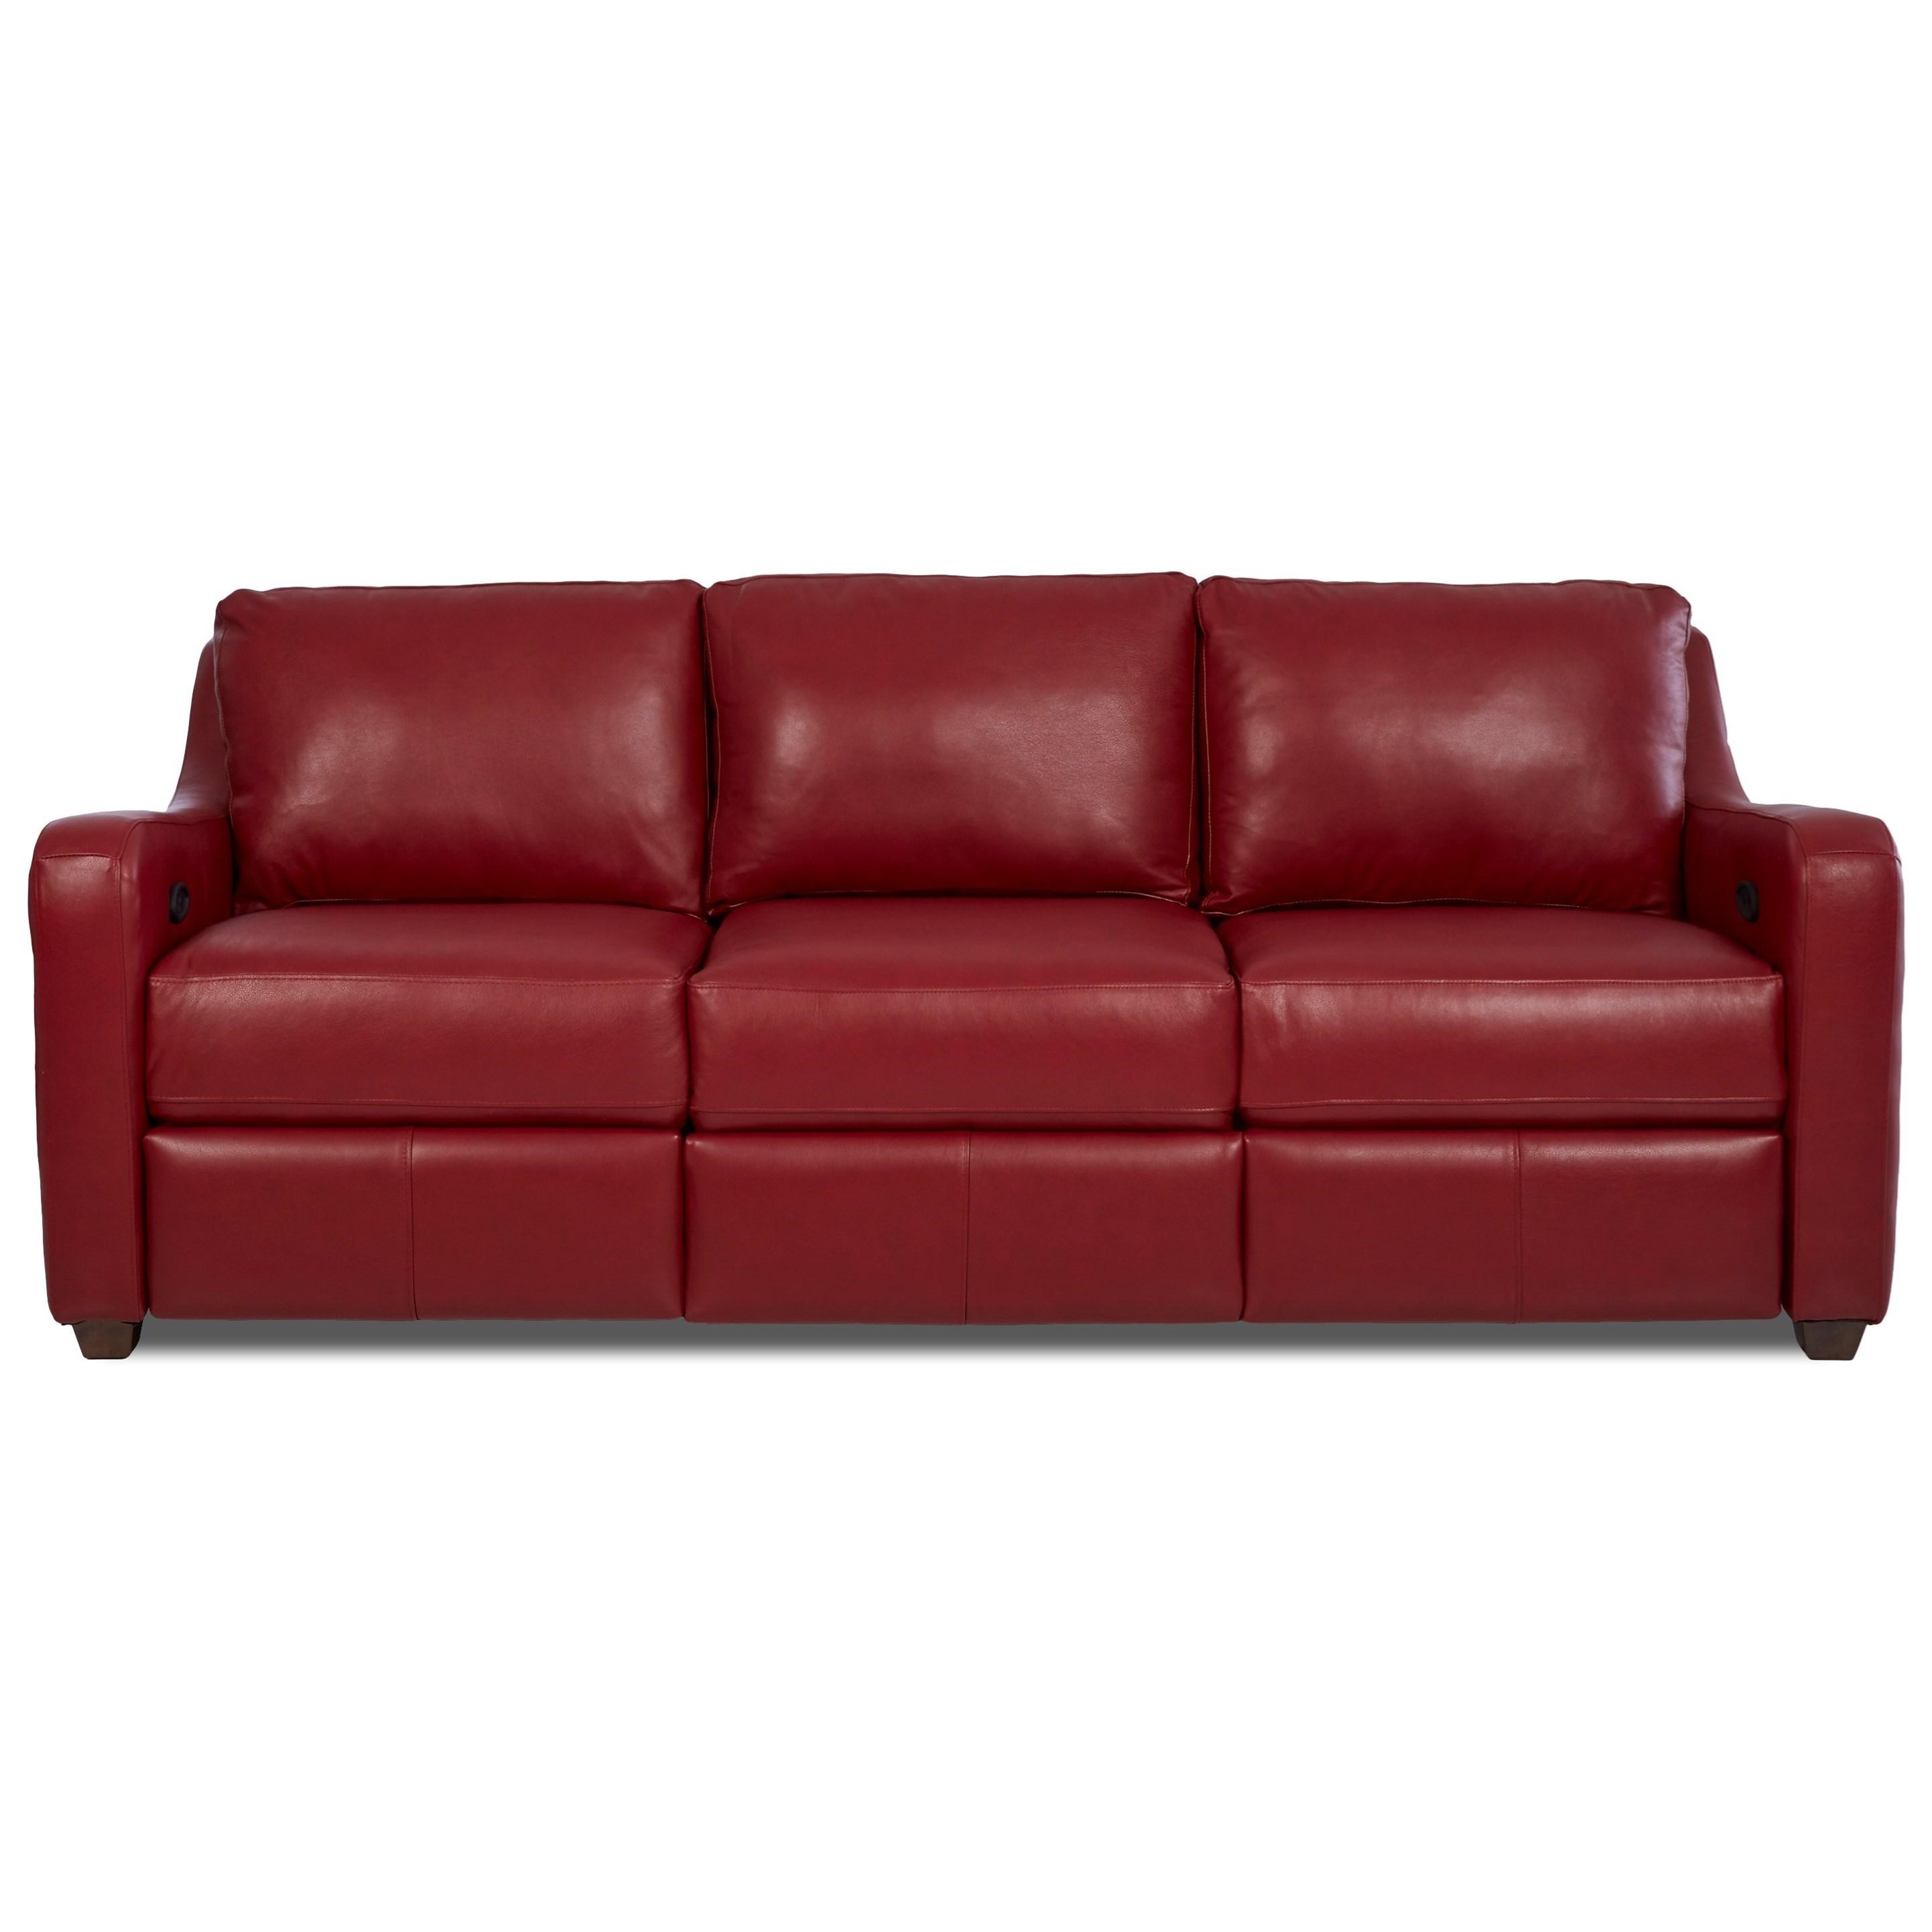 Klaussner Greer Power Hybrid Sofa - Item Number: LV29203 PWHS-DURANGO STRAWBERRY